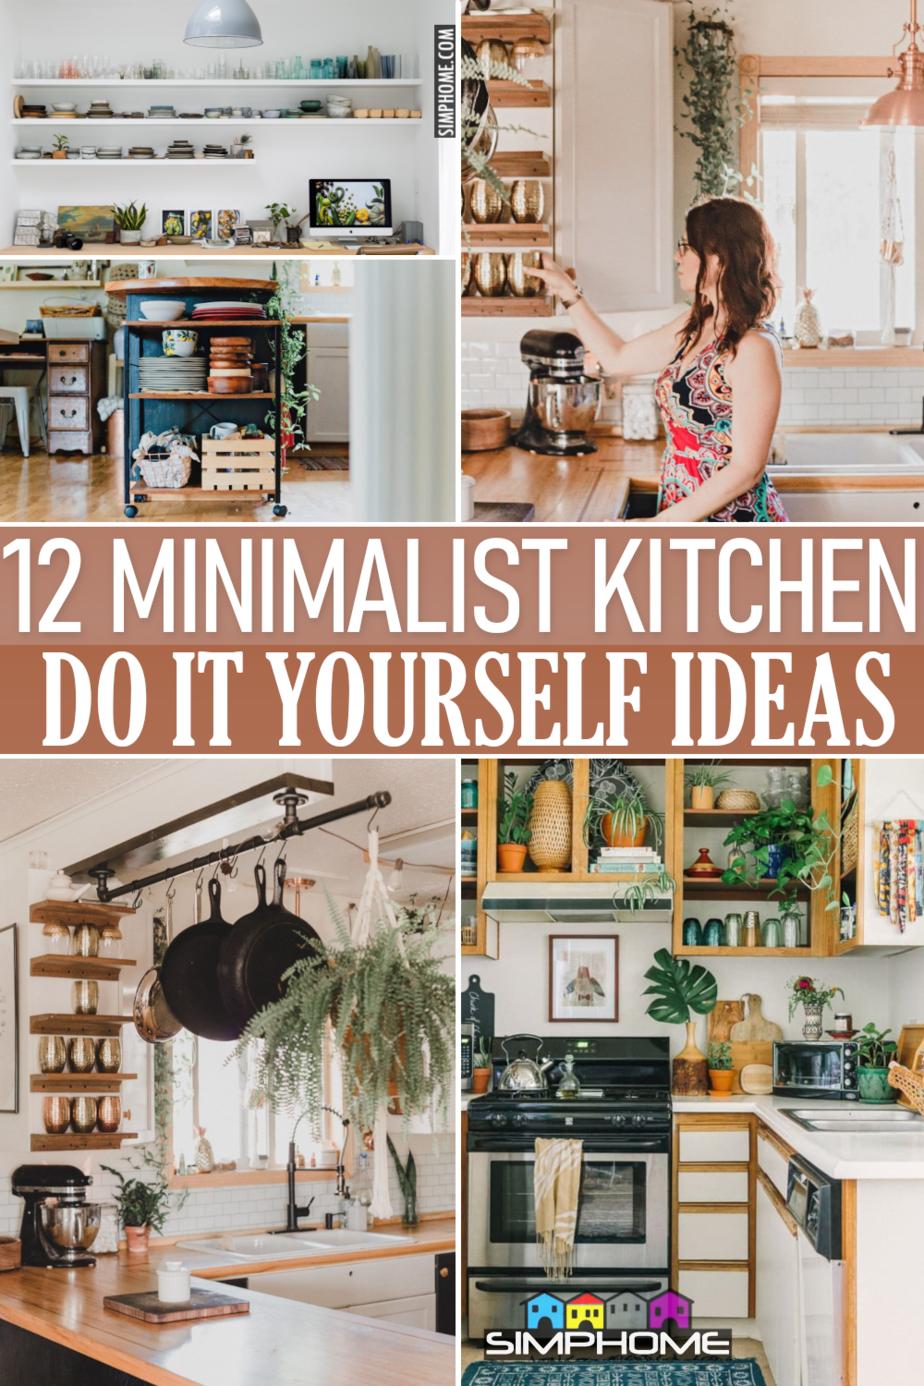 12 Minimalist Kitchen DIY ideas via Simphome.comFeatured Image